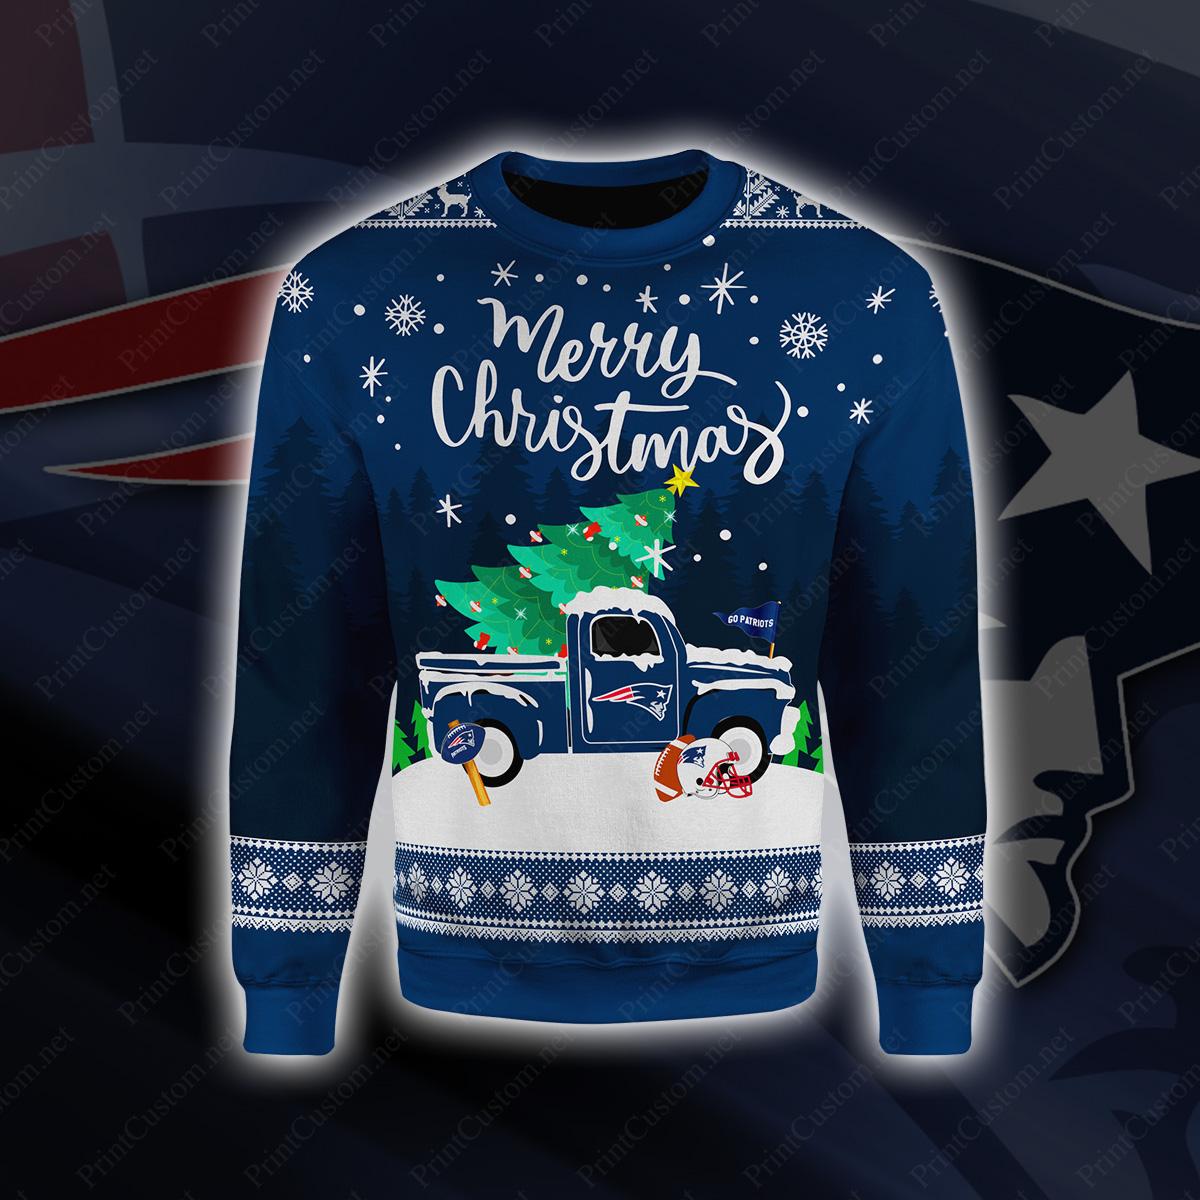 New england patriots merry christmas full printing shirt 2